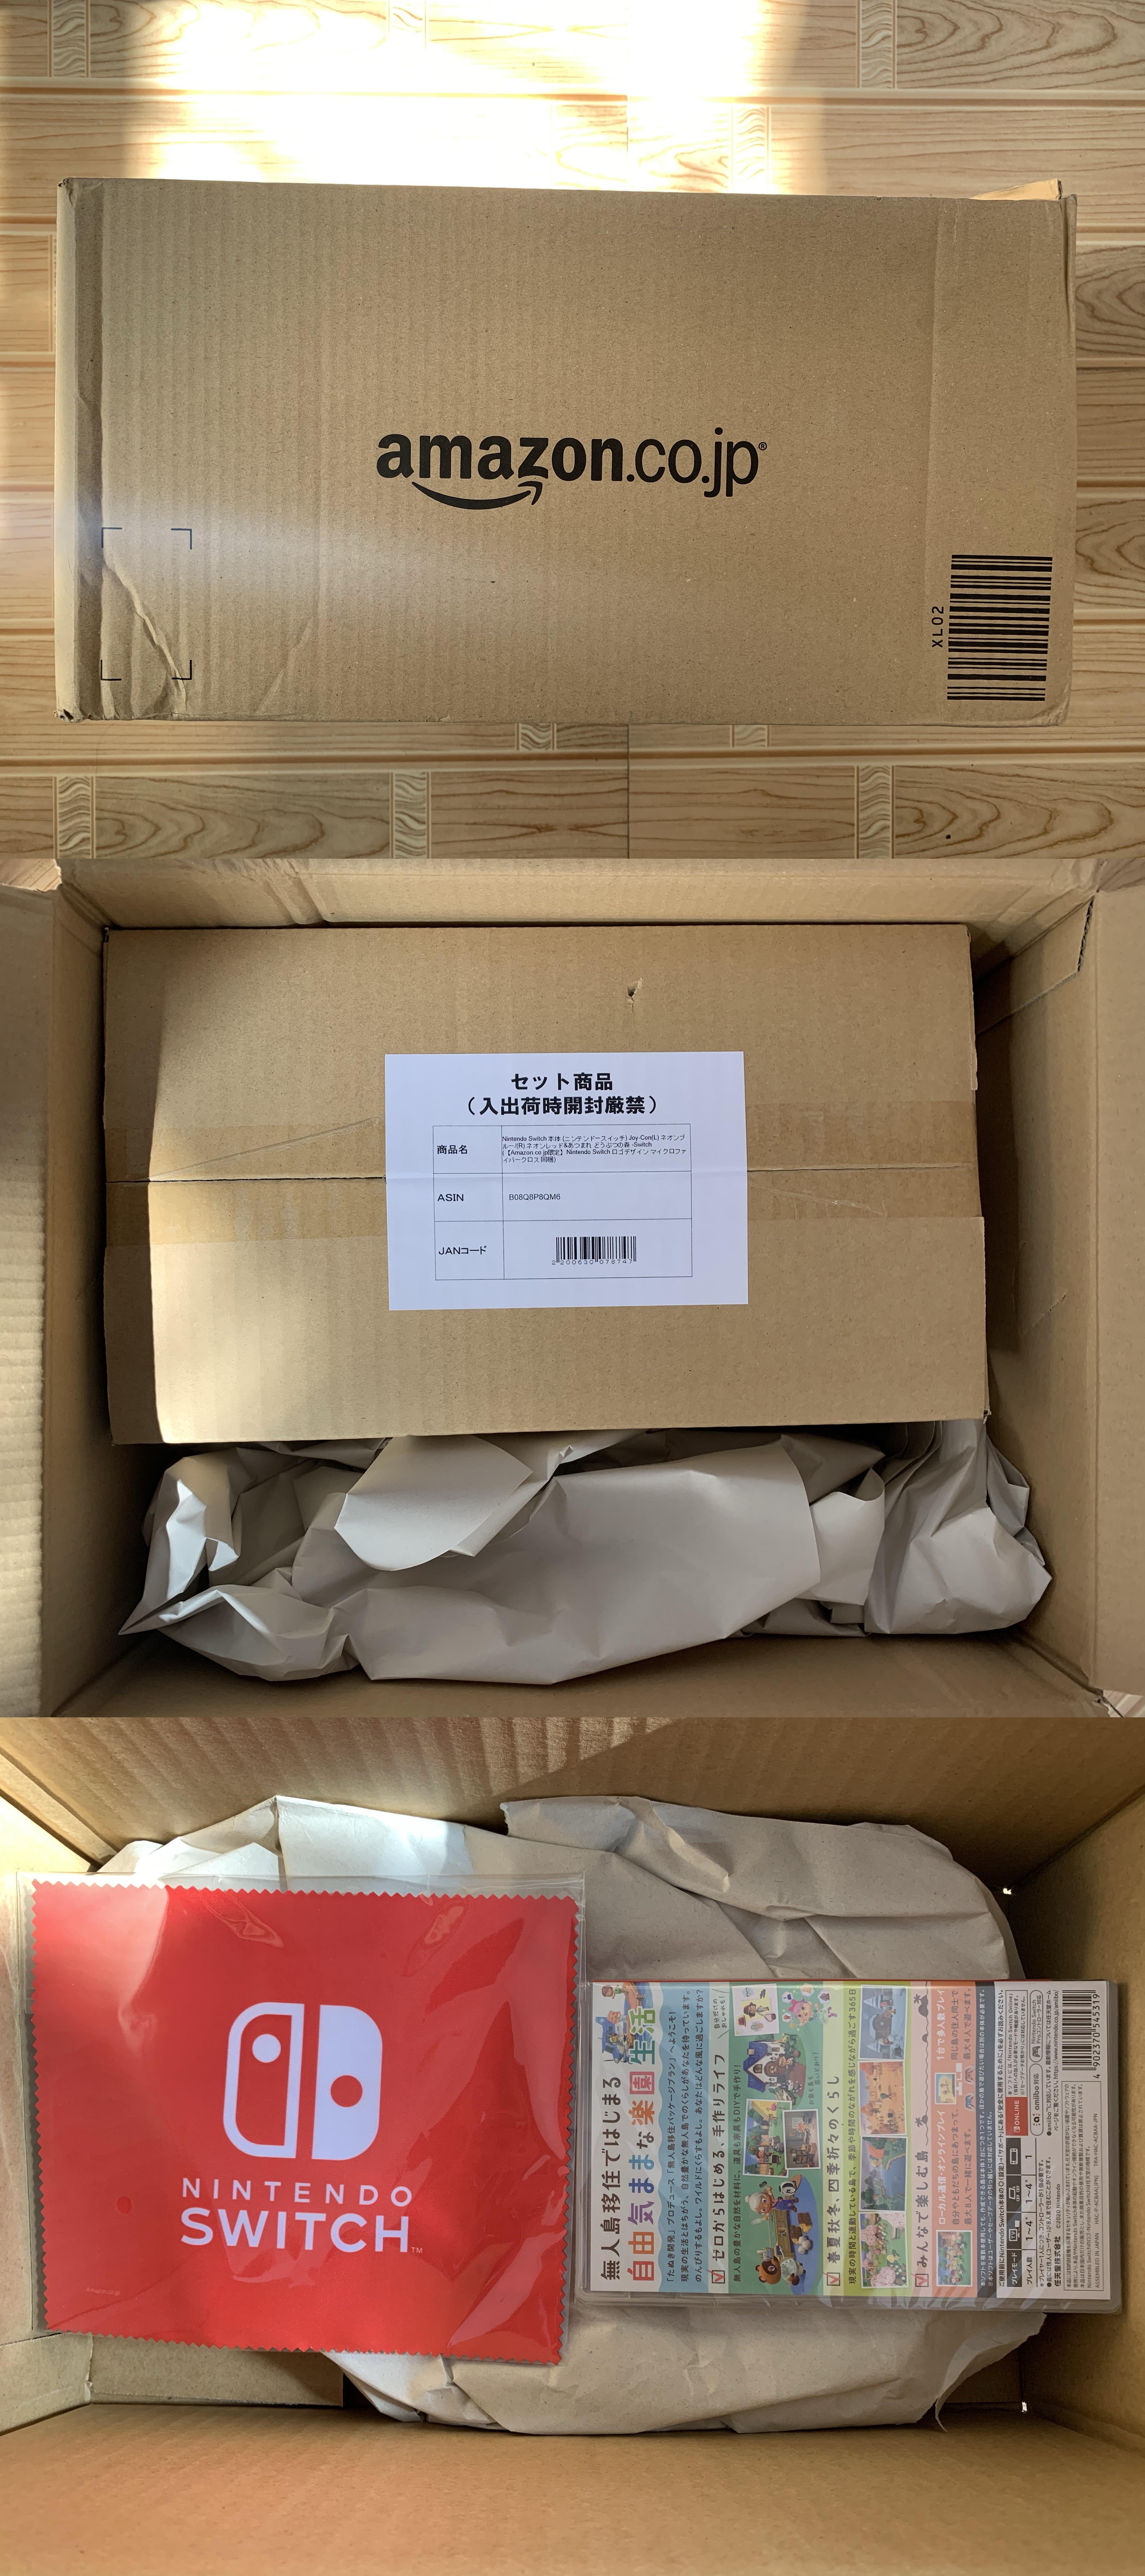 ▲ amazon.co.jp 包装纸箱